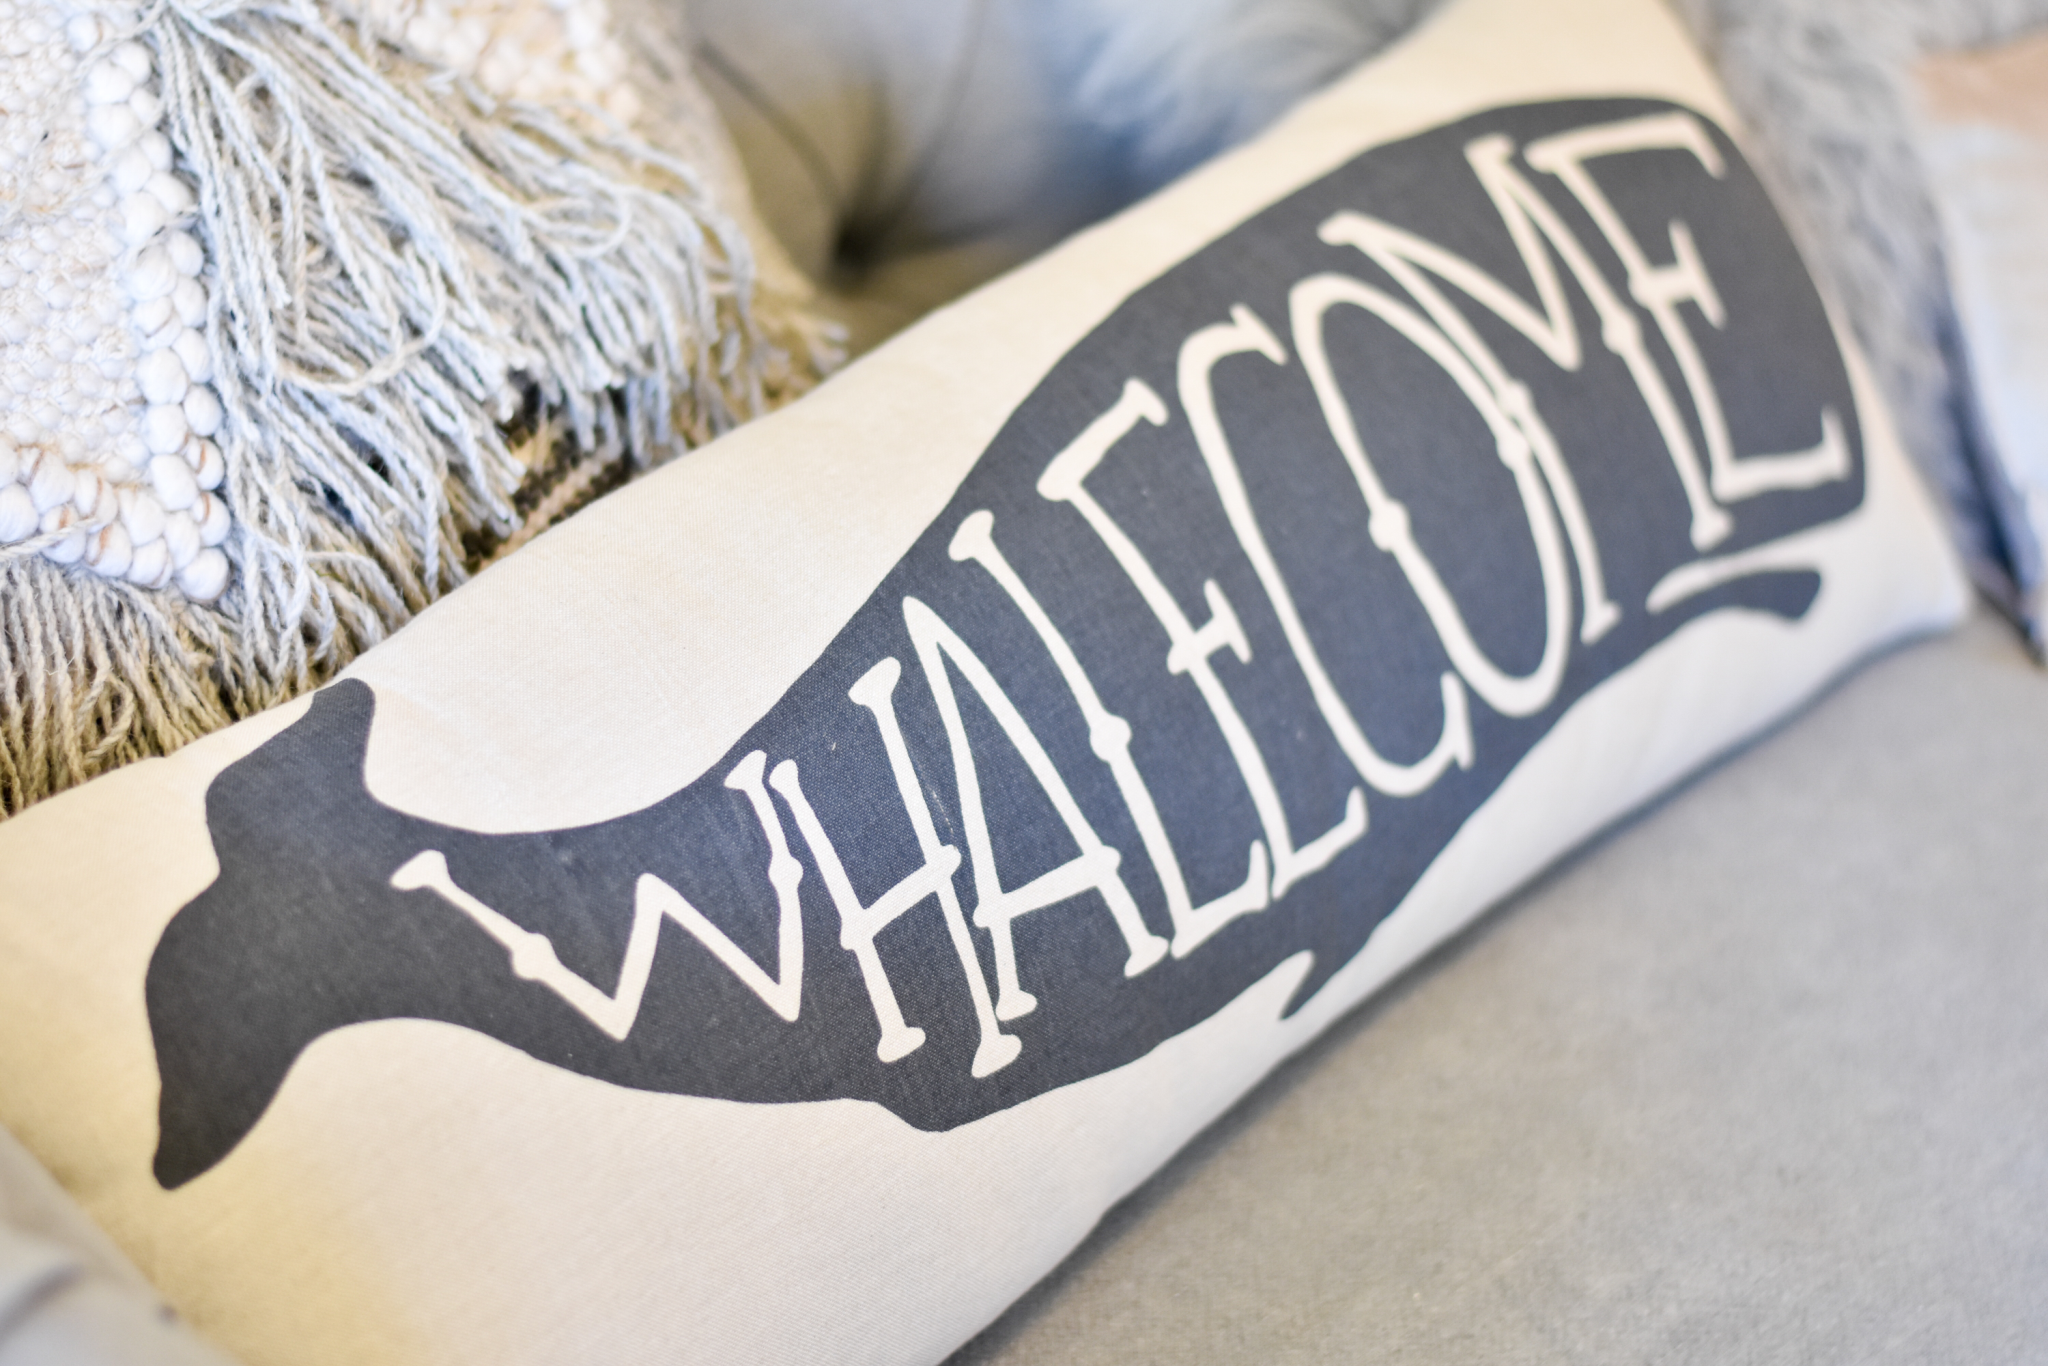 whalecome pillow da9084 Q0YFM0YARV5F4